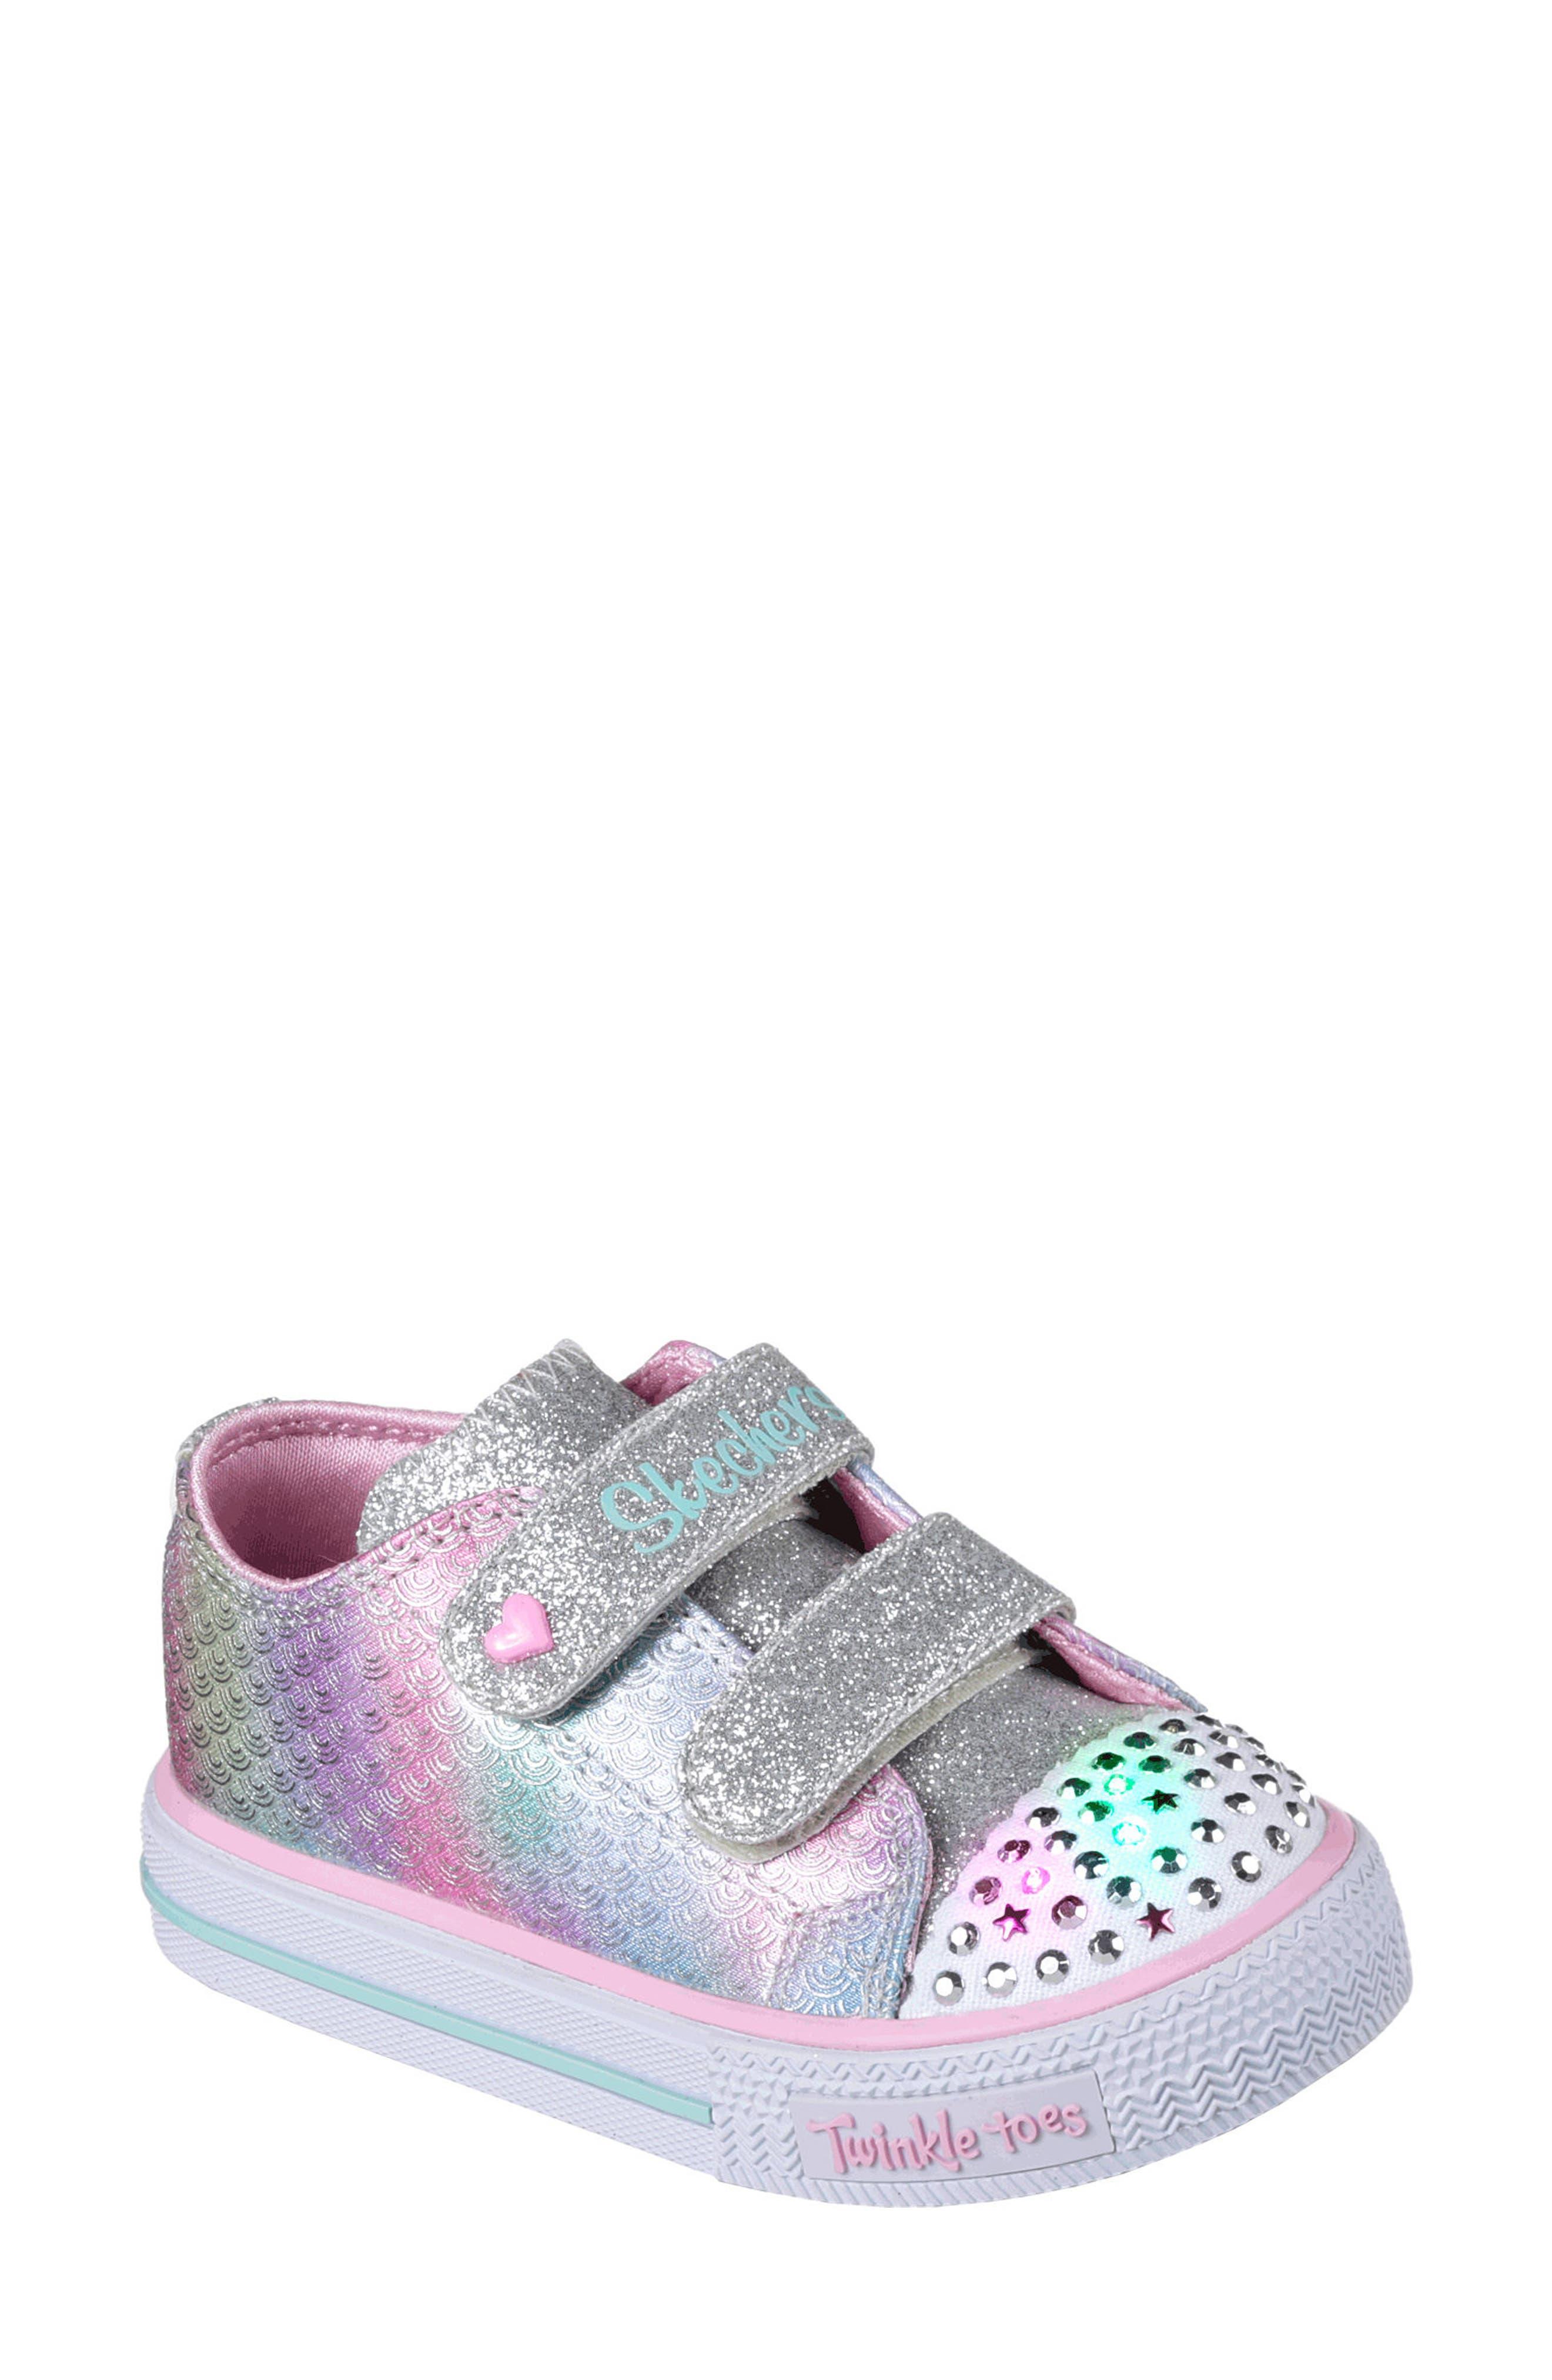 Shuffles - Itsy Bitsy Light-Up Sneaker,                             Main thumbnail 1, color,                             Silver/ Multi